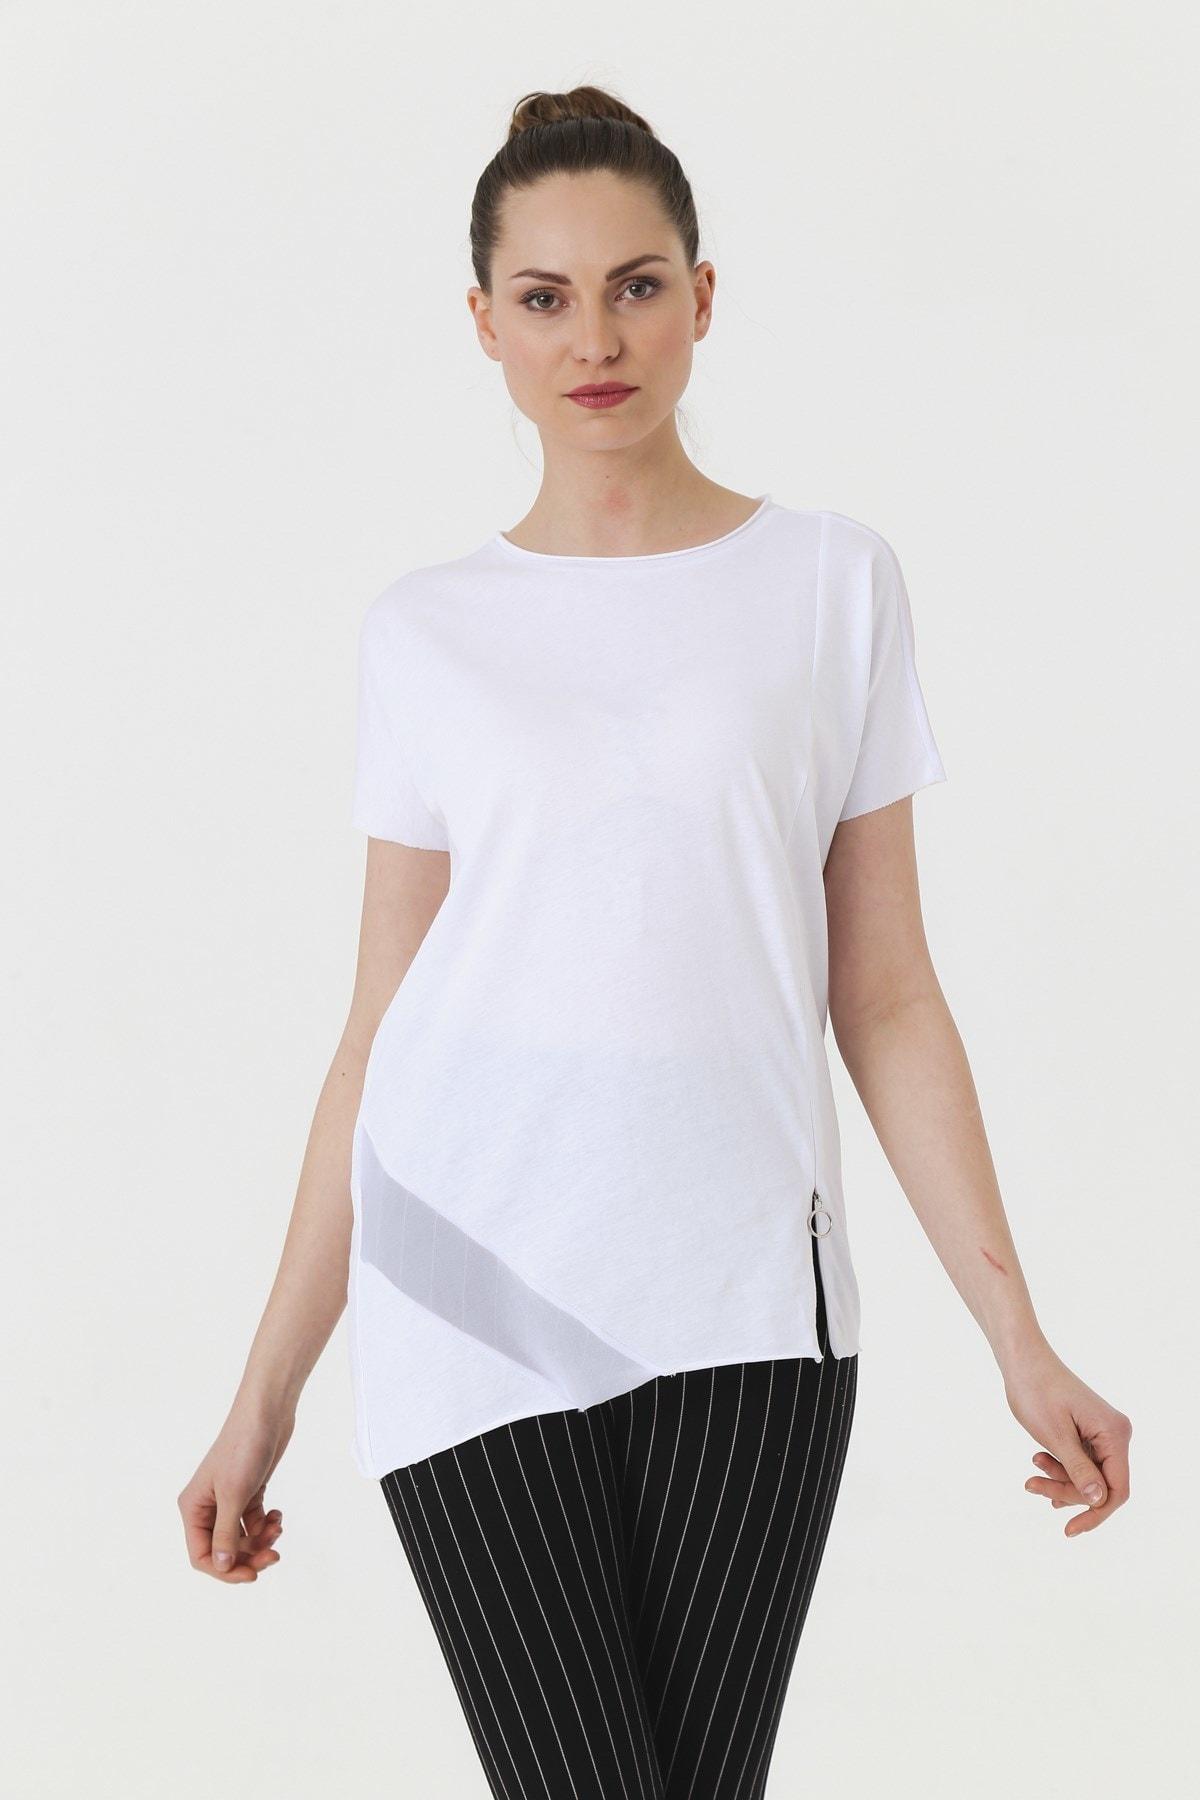 Jument Kadın Beyaz T-shirt 7095 0